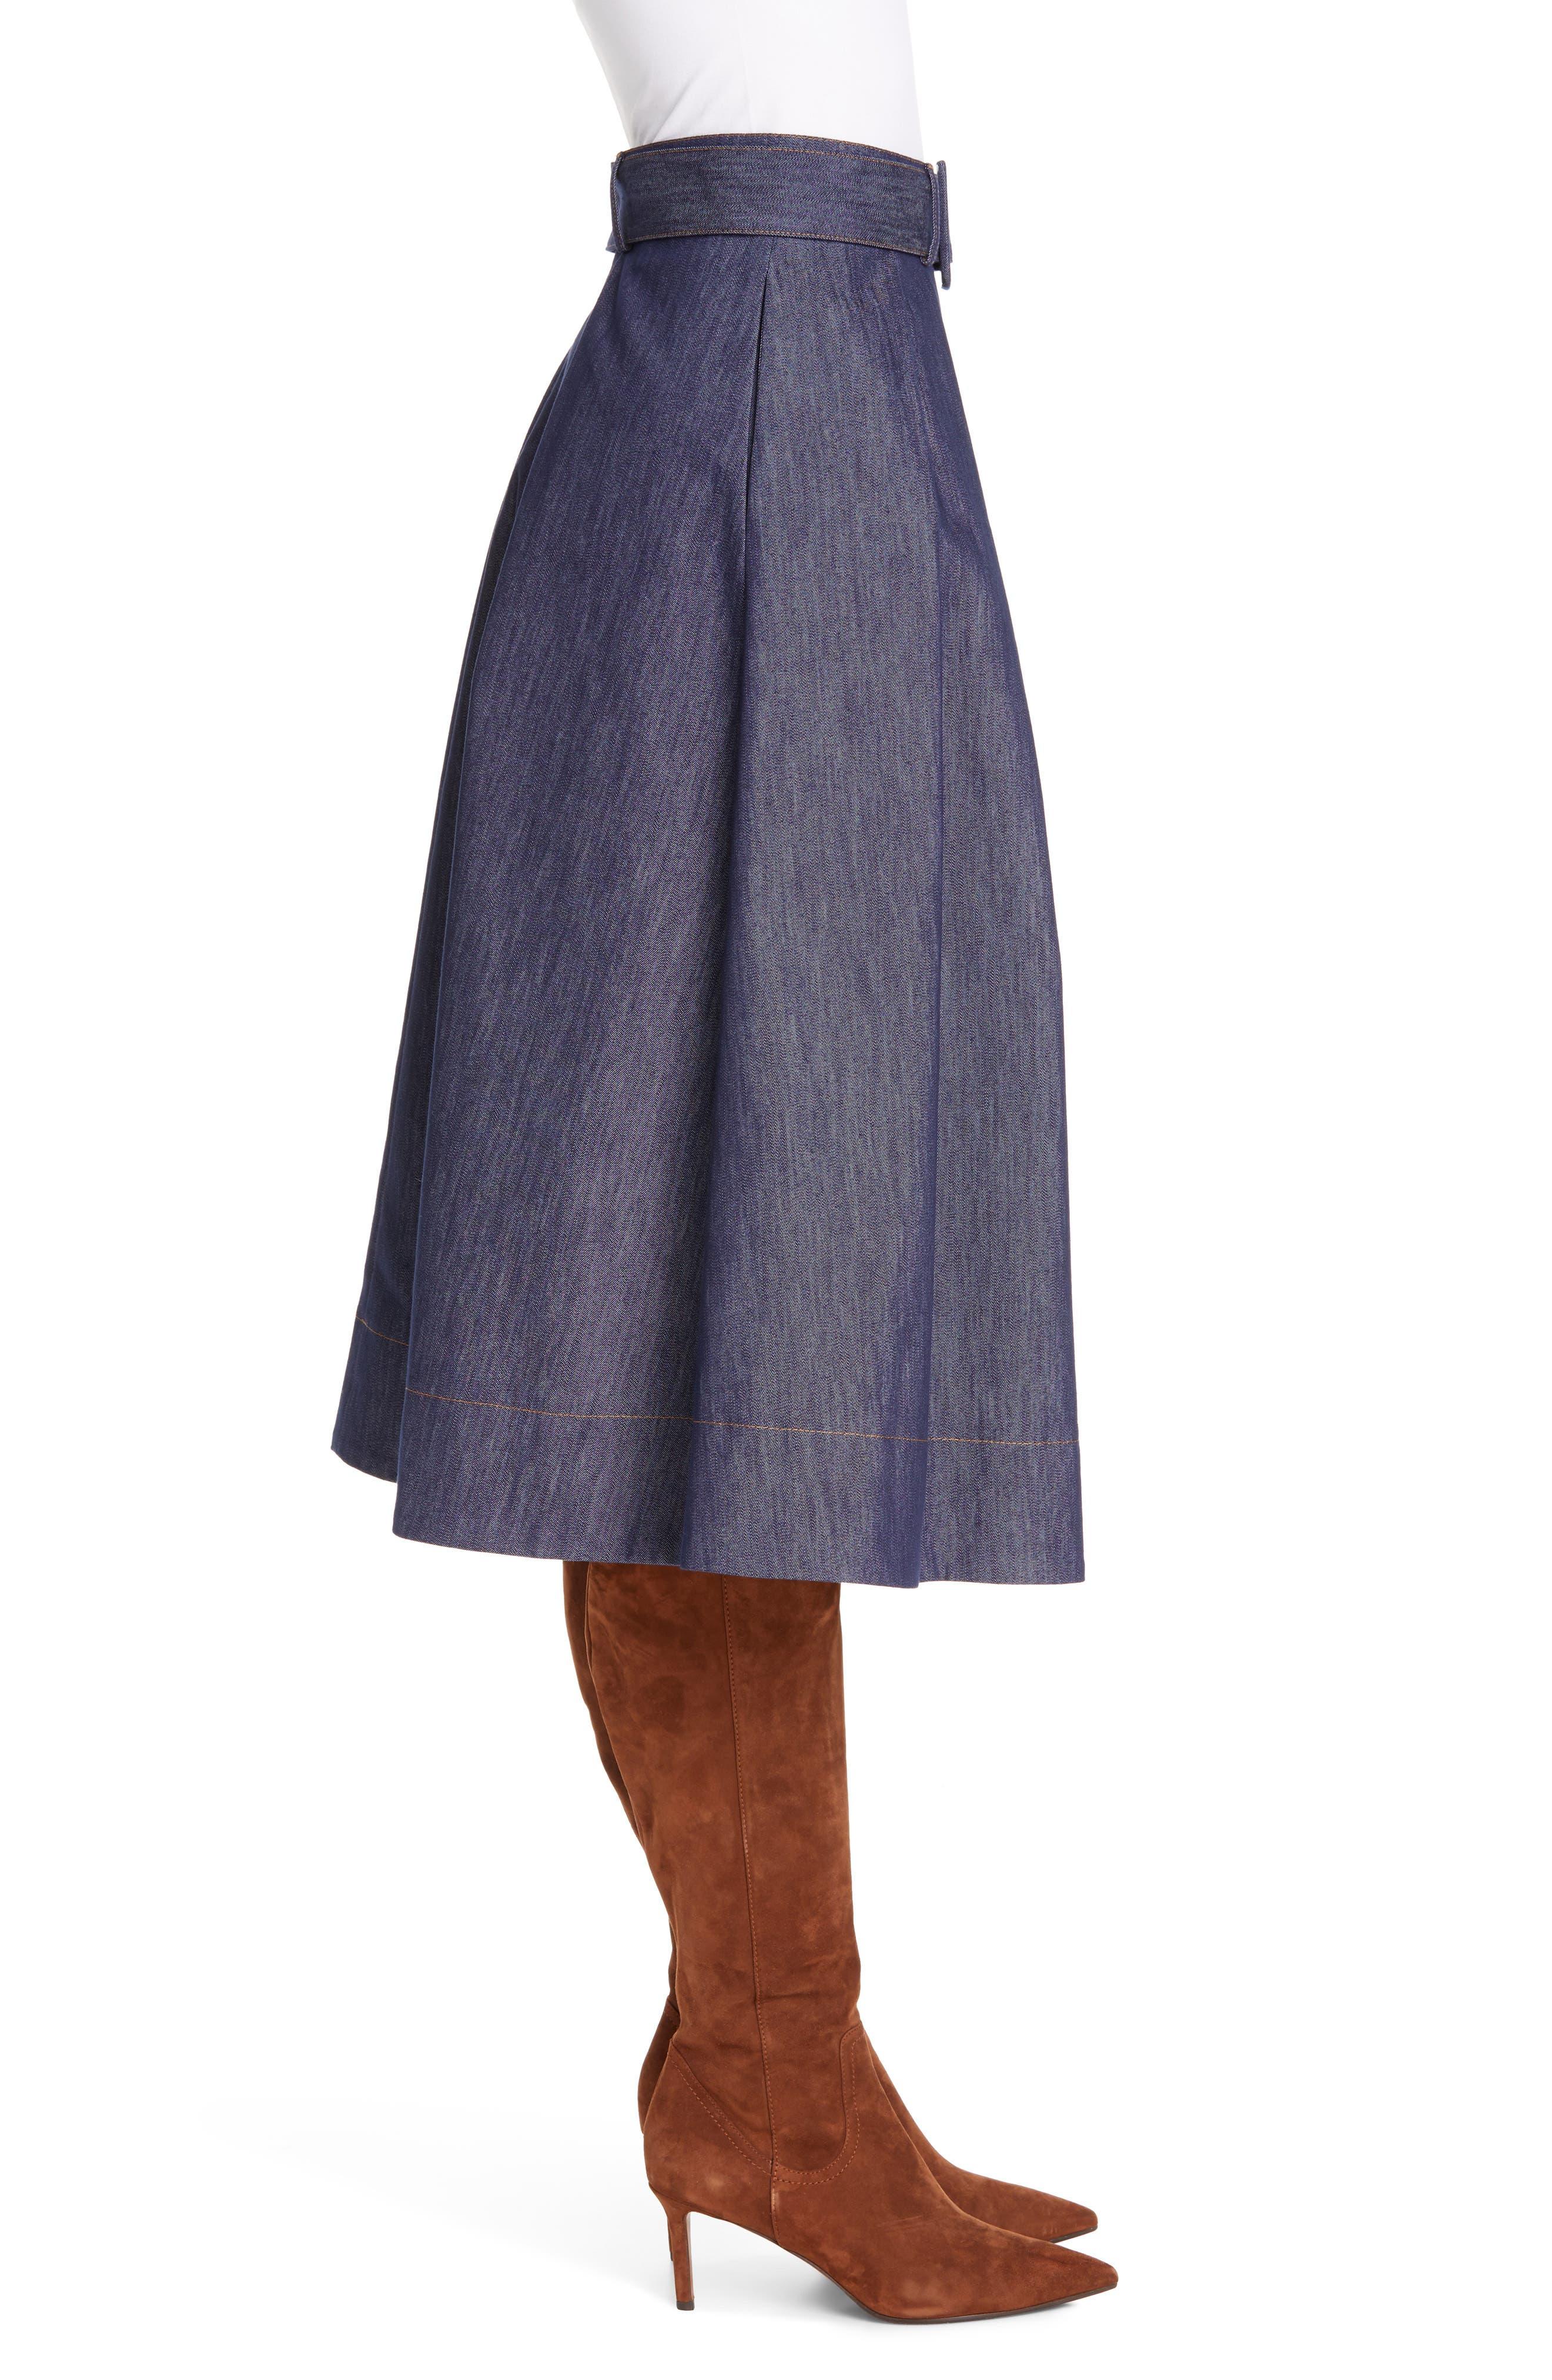 TOMMY X ZENDAYA, Belted Denim Skirt, Alternate thumbnail 3, color, 402